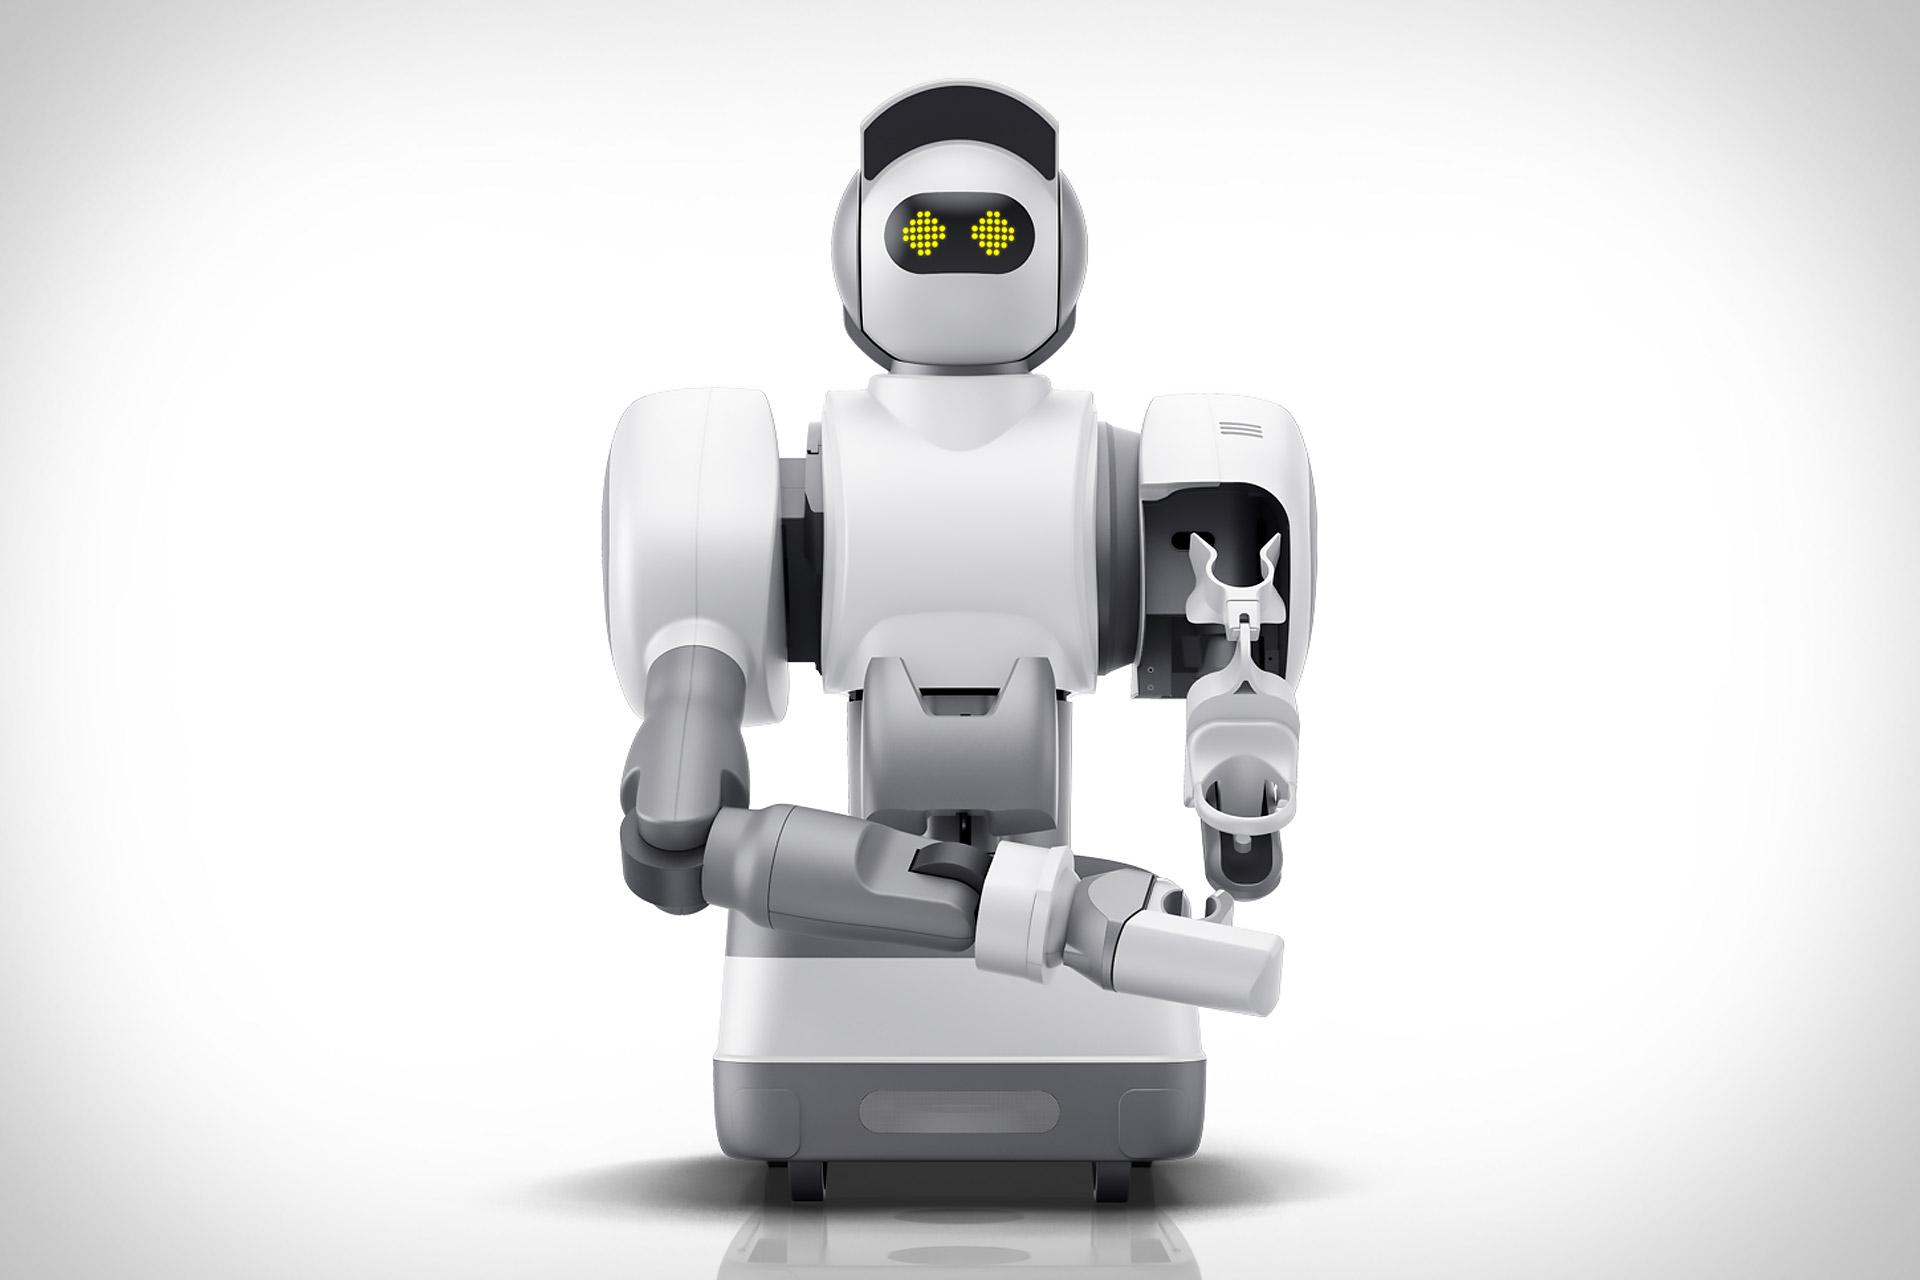 aeolus-robot.jpg